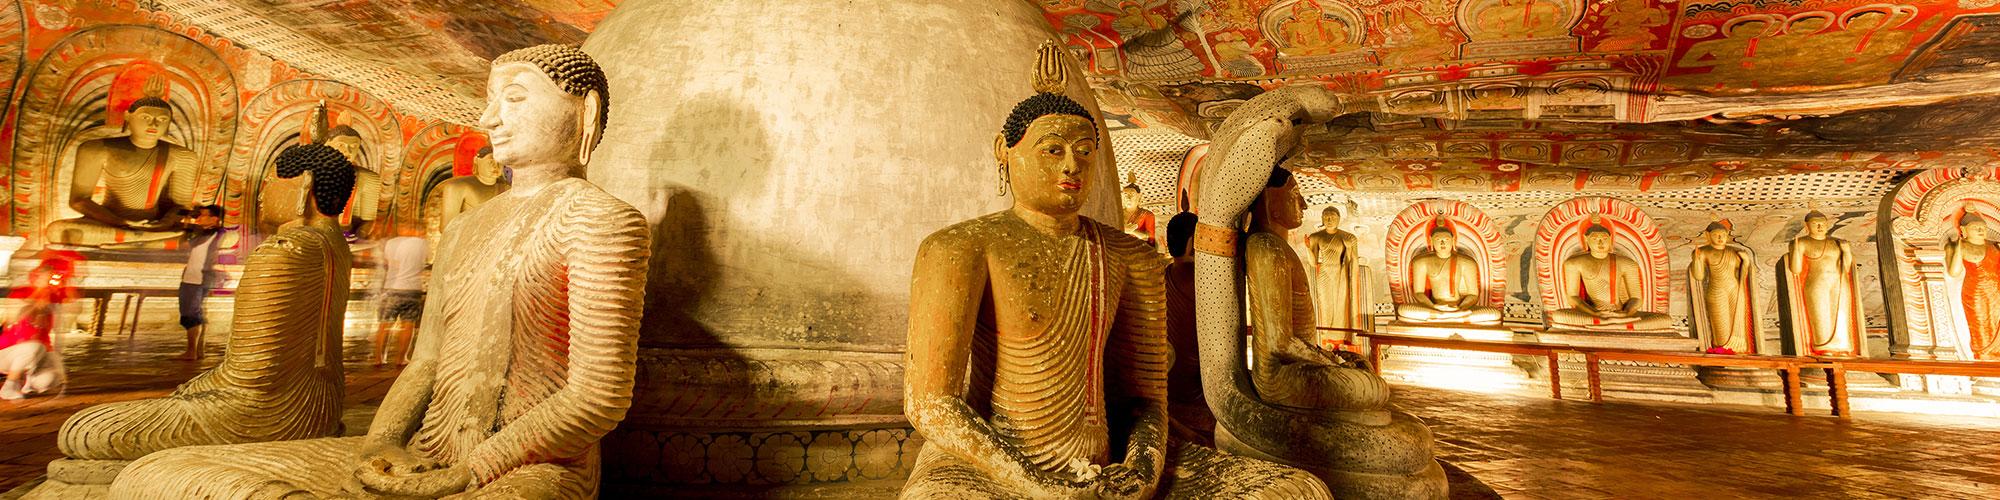 Sigiriya Lion Rock day tour from Kandy